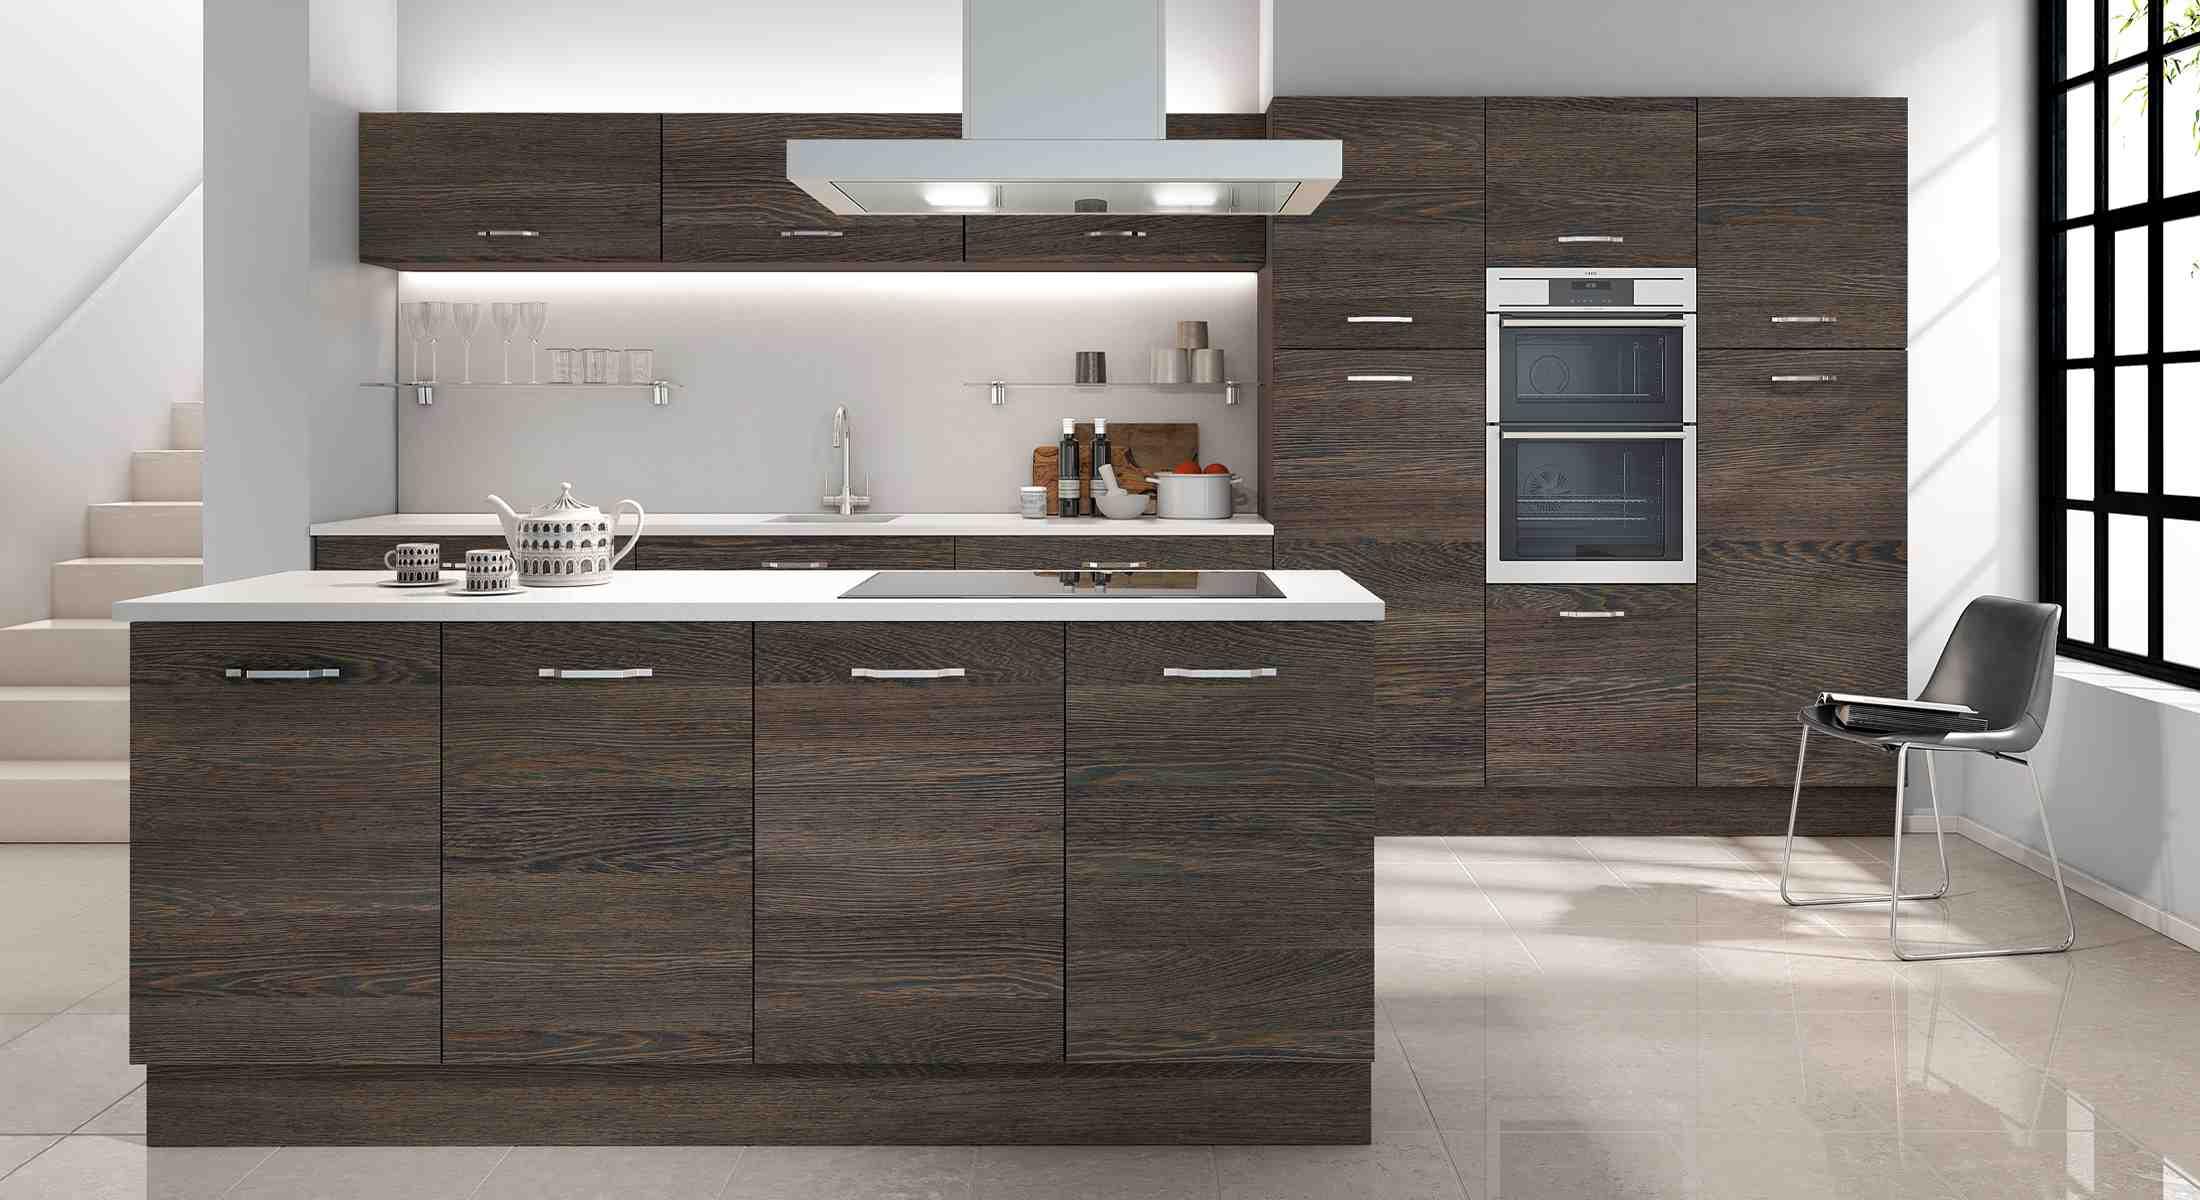 kitchens in burryport, wales by steve williams - vassa structured - true handleless